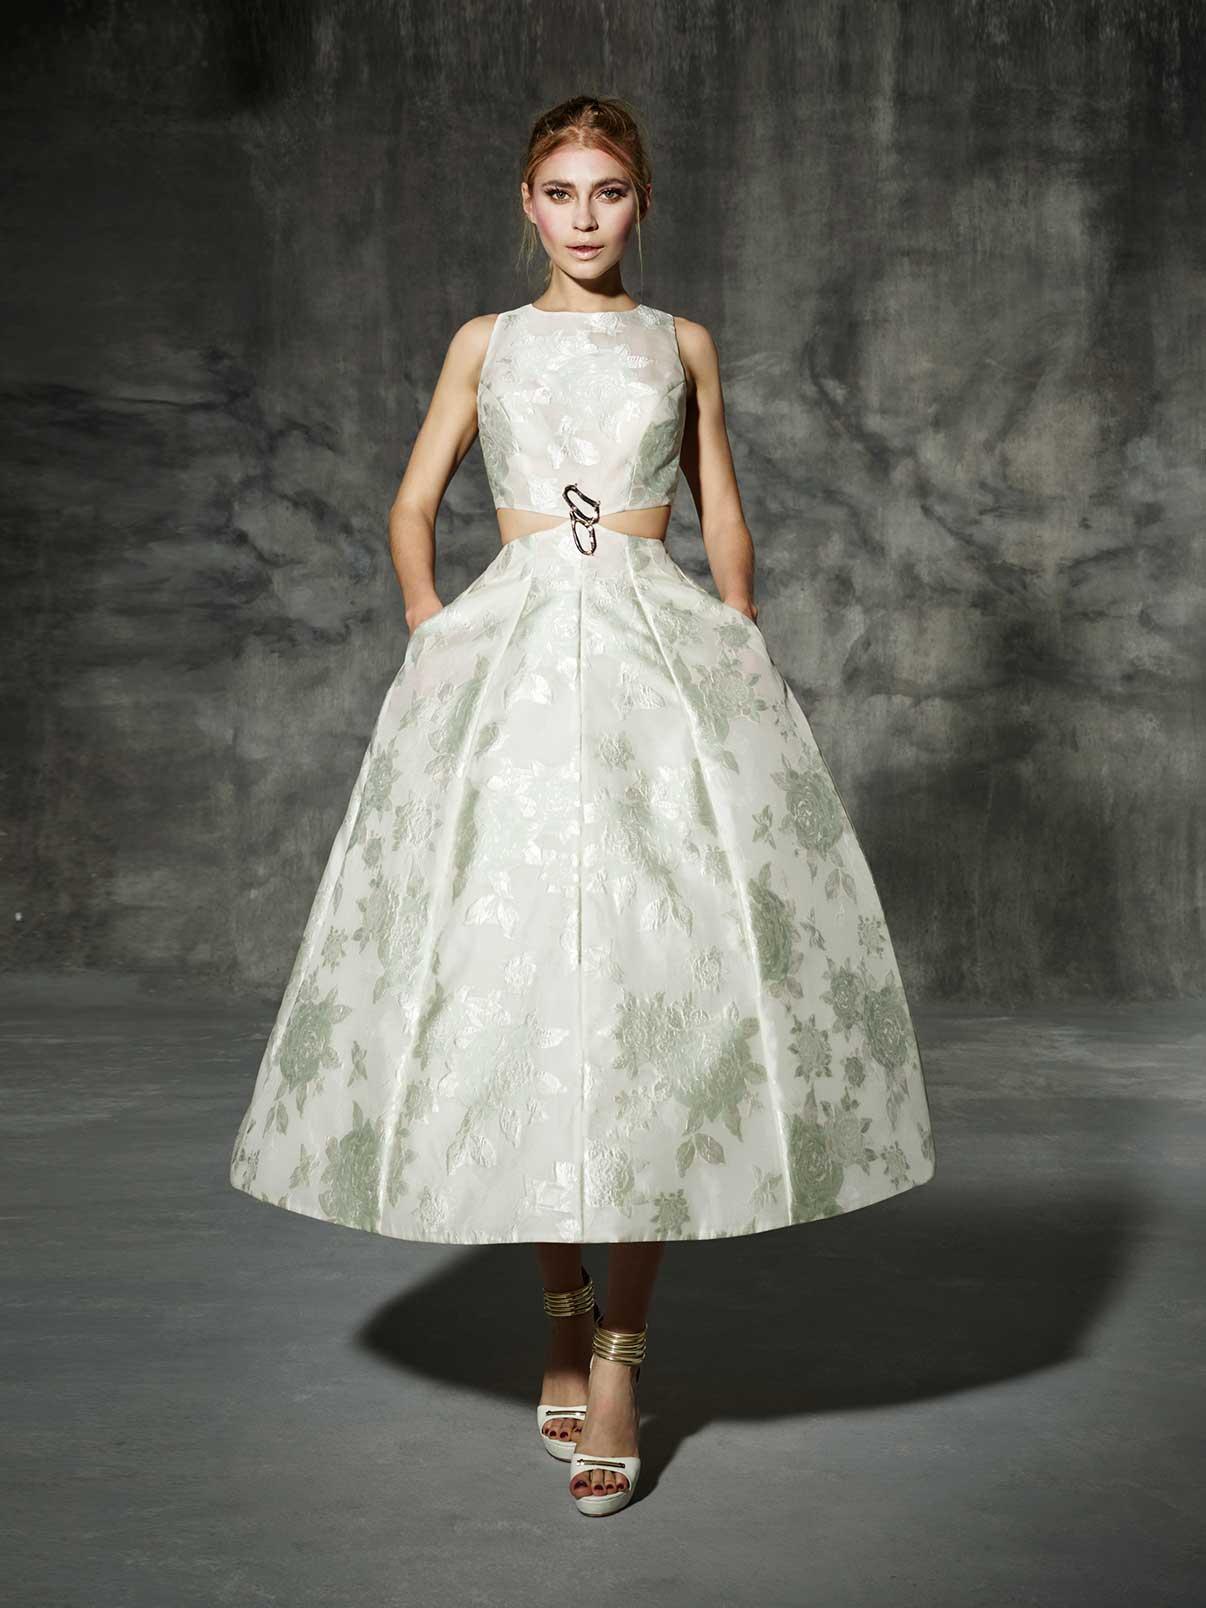 Vintage Wedding Dress - Yolan Cris Tea Length Begur Wedding Dress